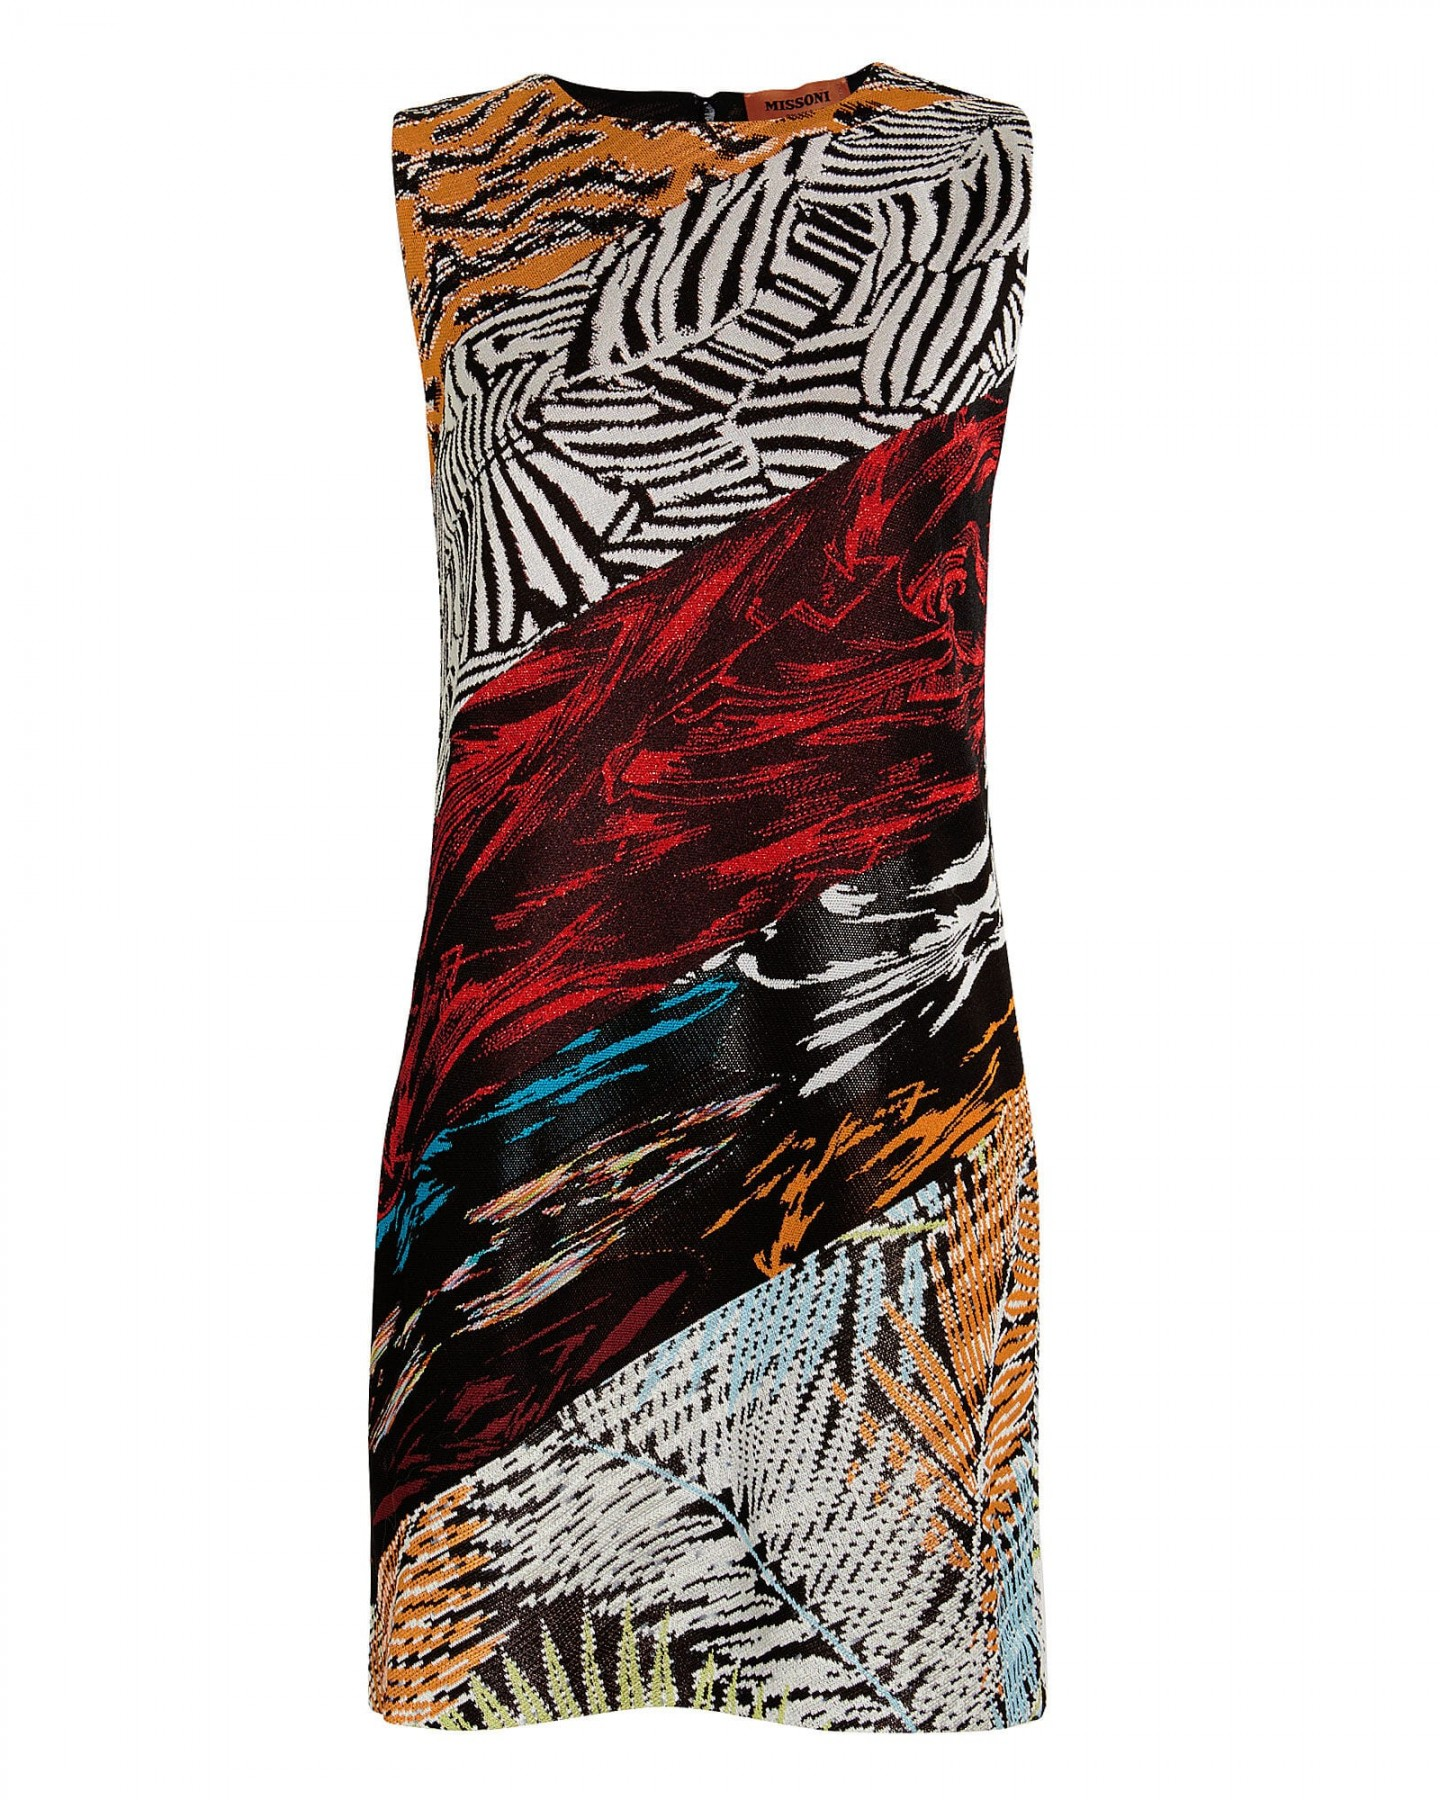 MISSONI Mixed Knit Jacquard Shift Dress